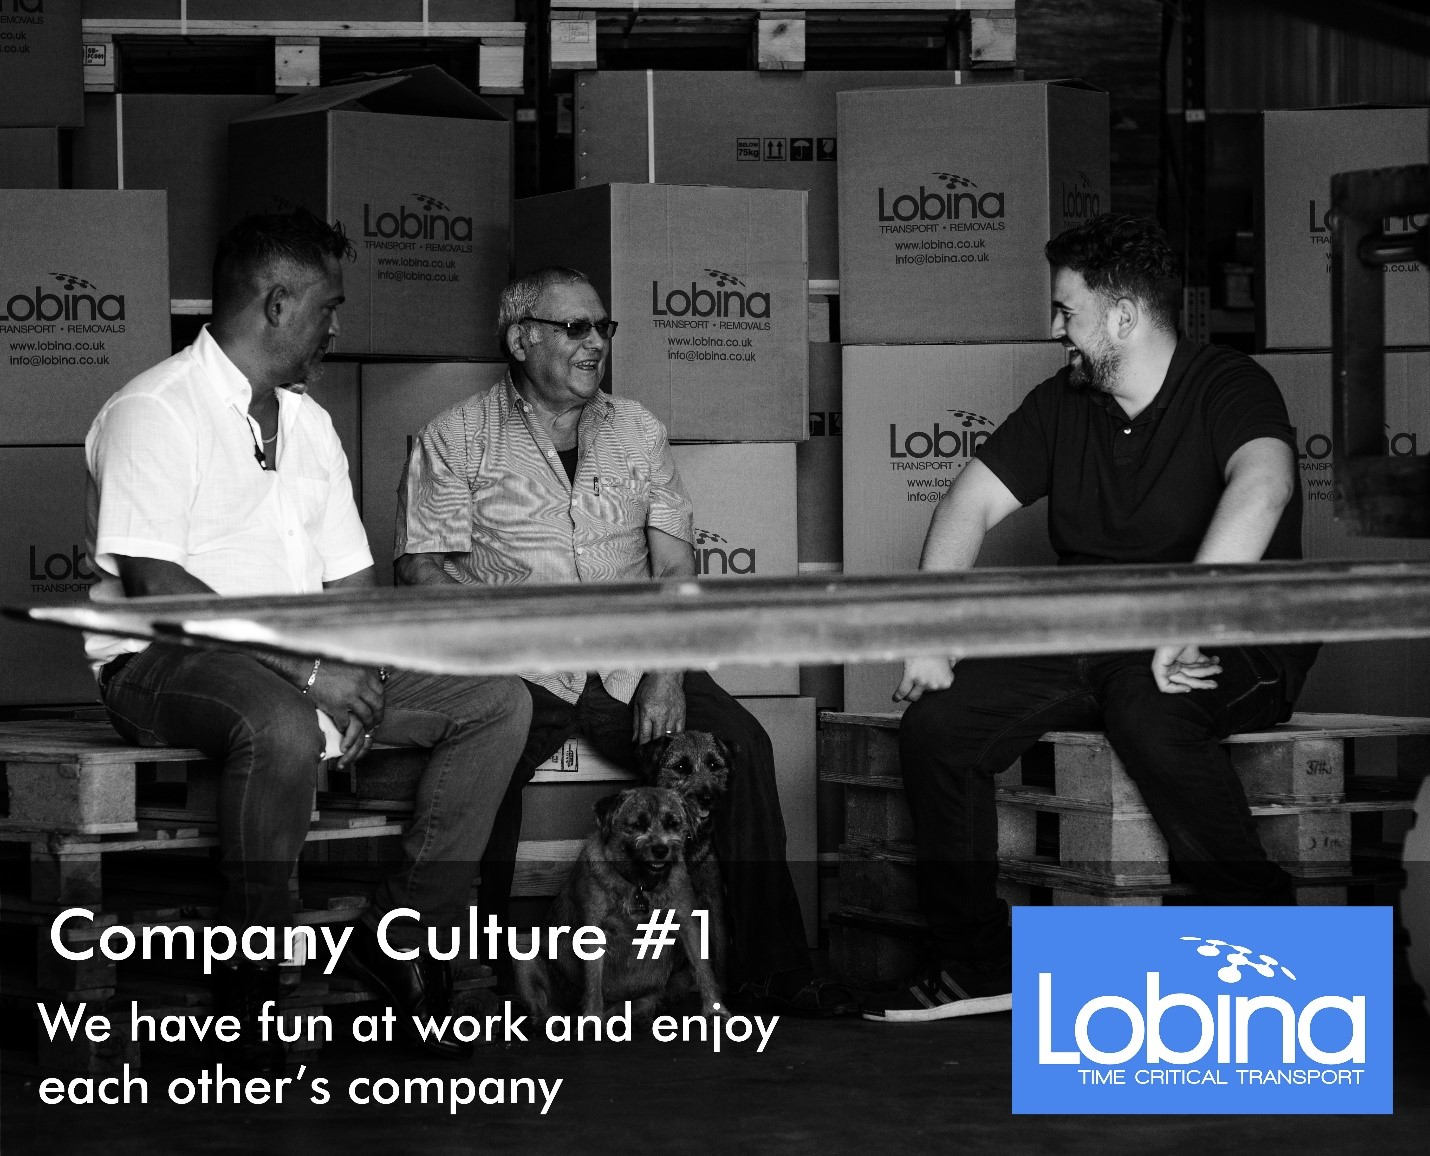 Lobina Time Critical Transport Company Culture number 1